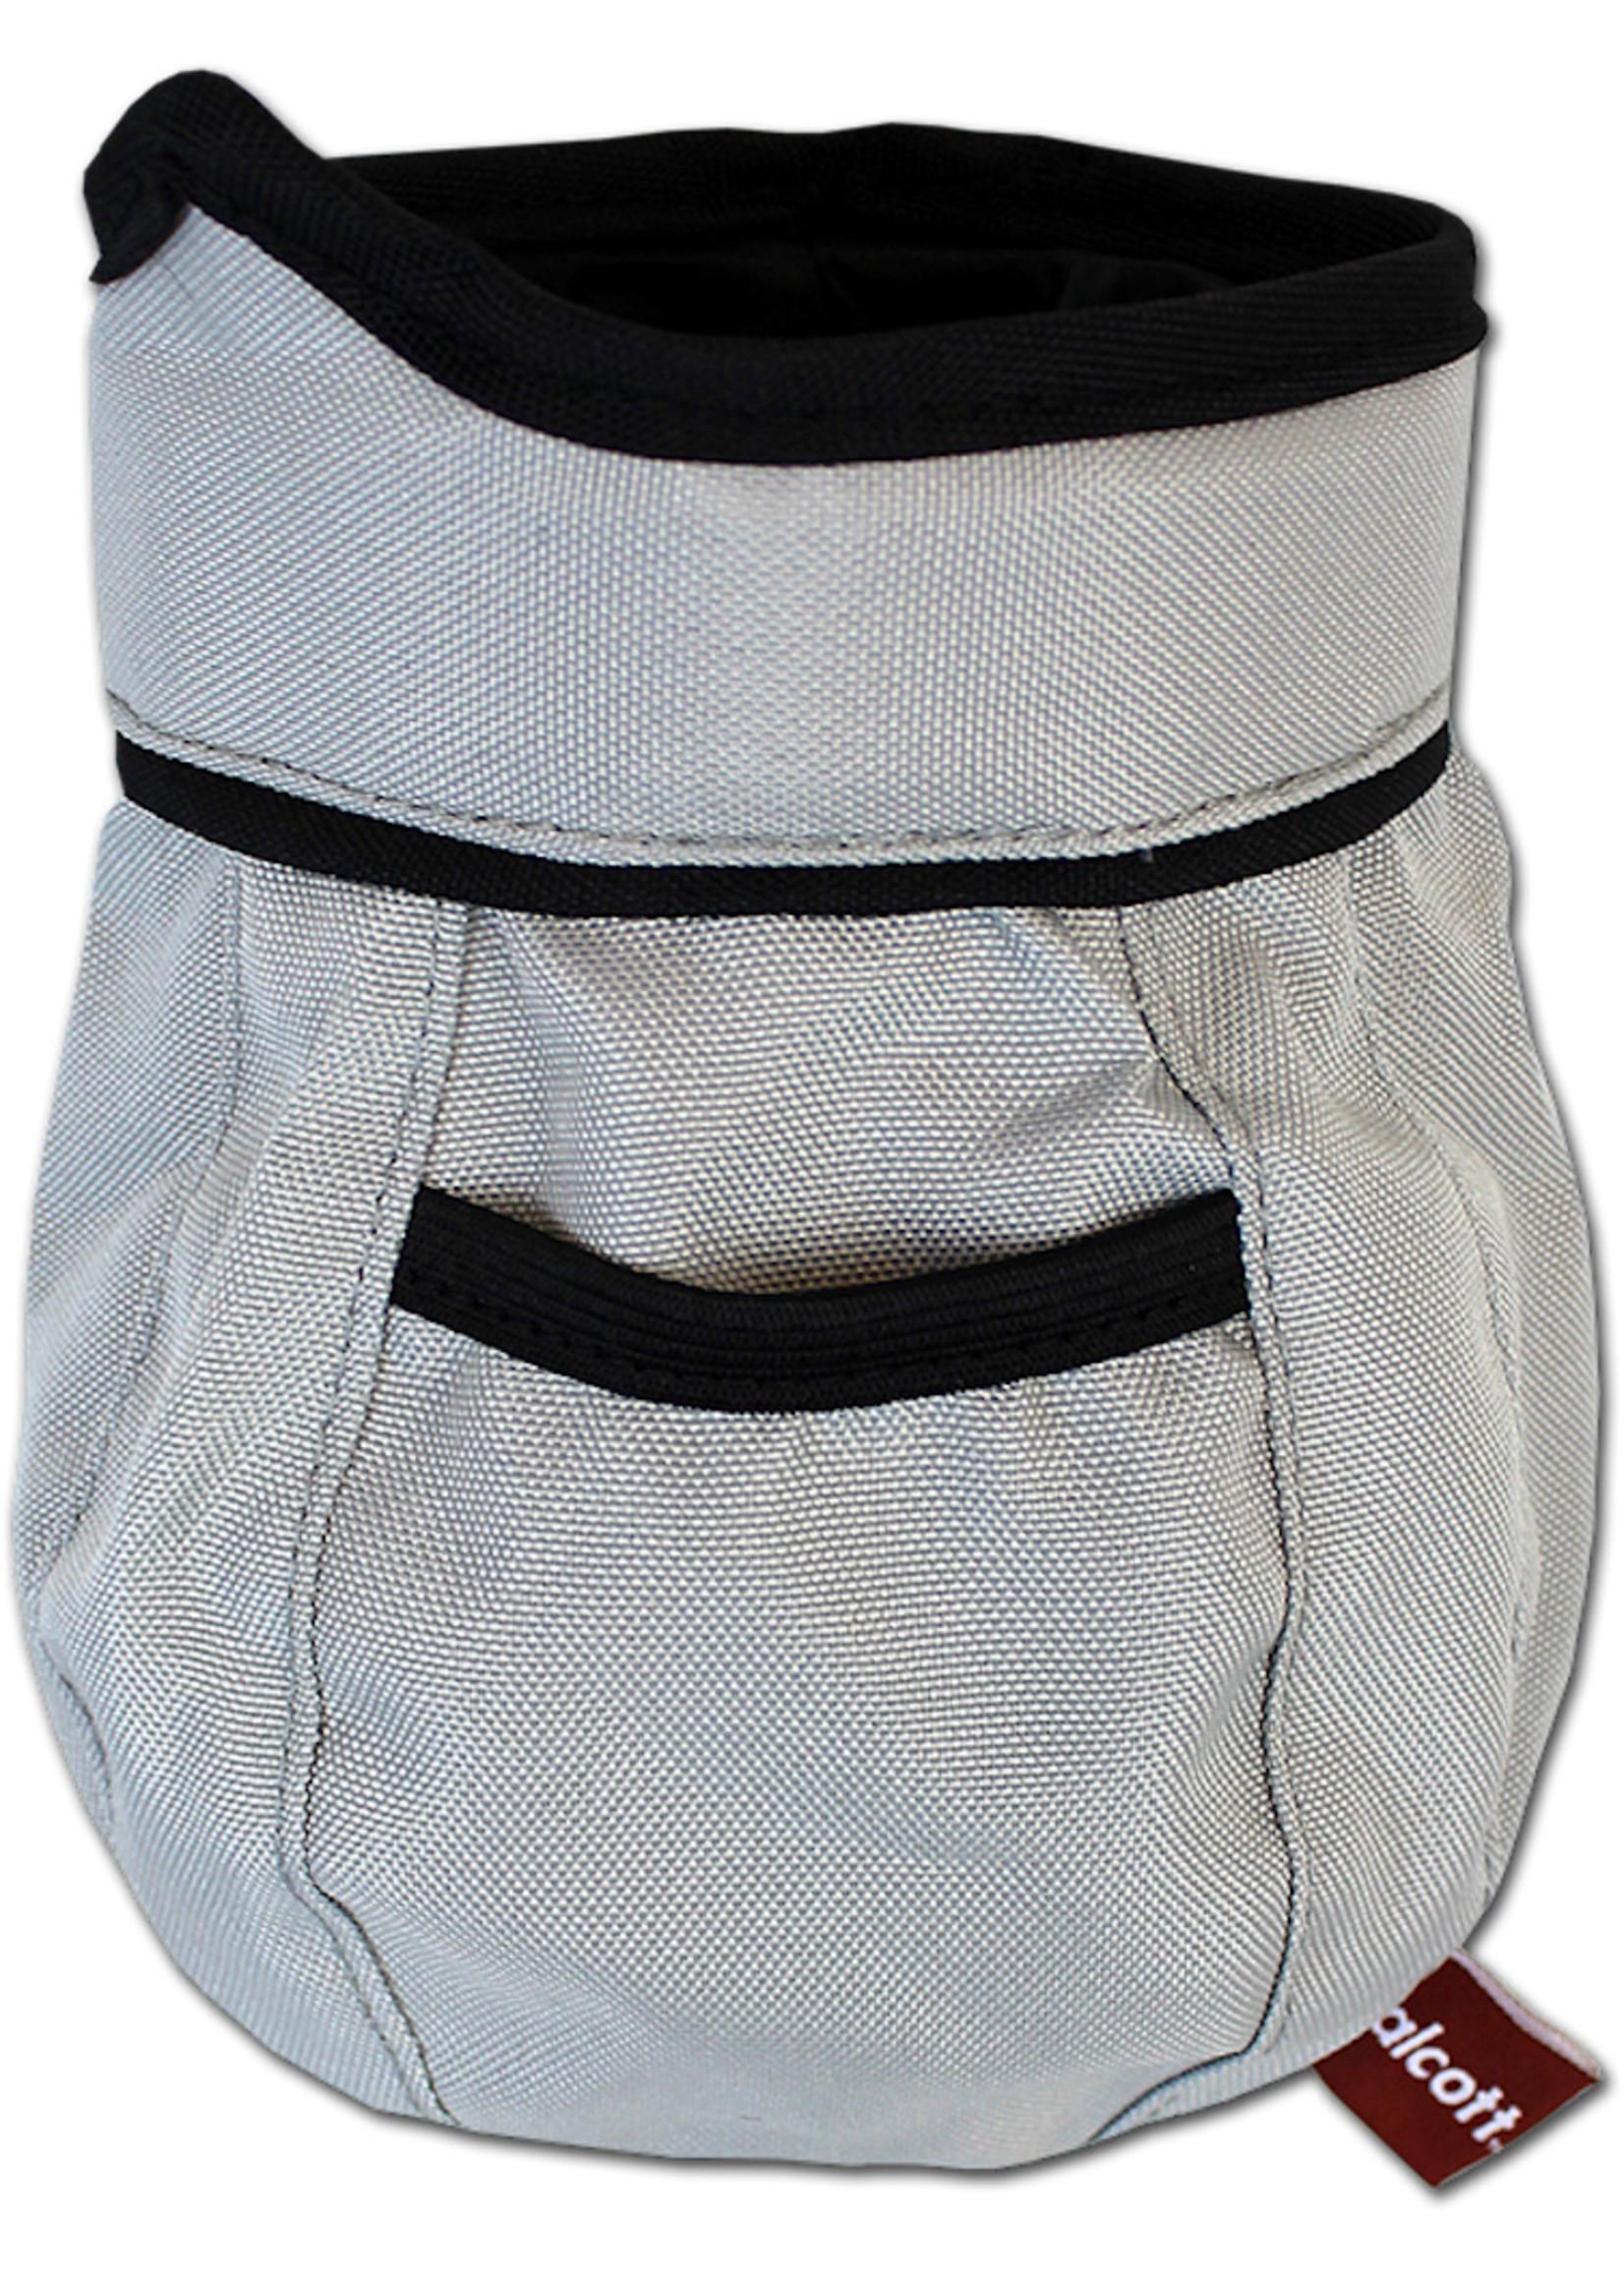 Alcott Training Treat Bag,  Ball Bag, All in One Treat + Ball Bag